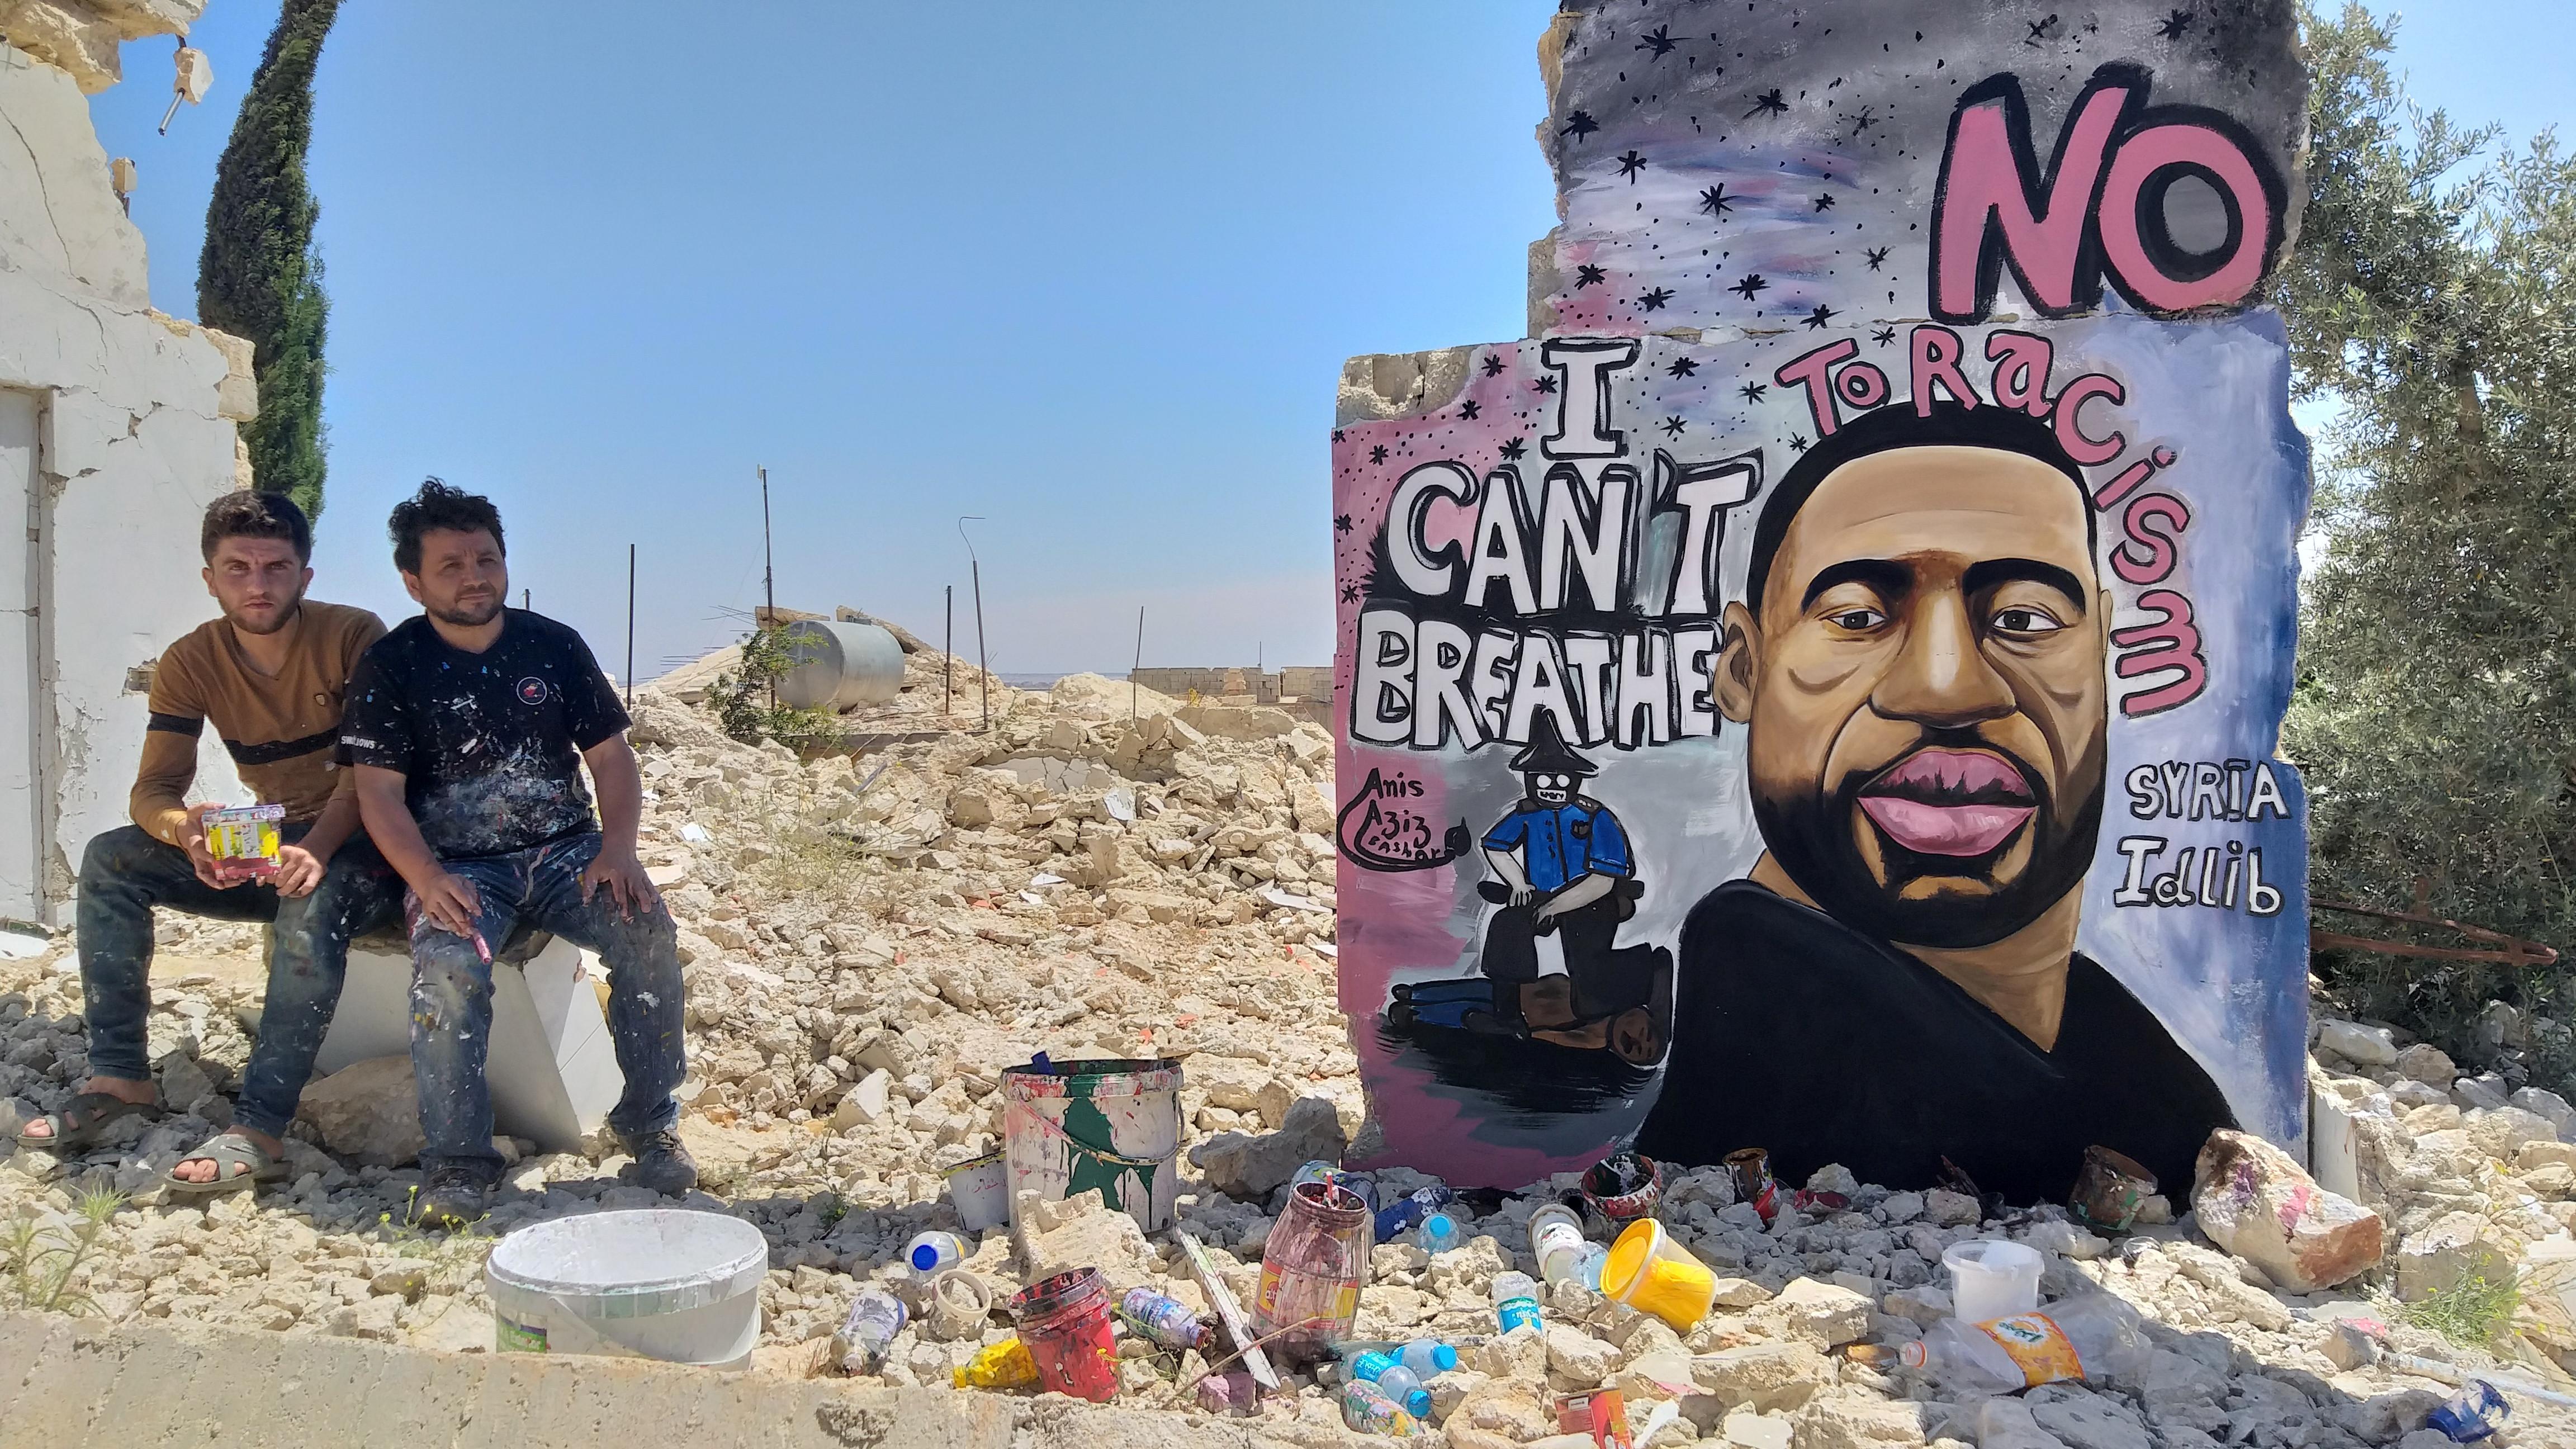 Artists Aziz Asmr and Anis Hamdoun pose next to a graffiti of George Floyd in Idlib, Syria June 1, 2020.